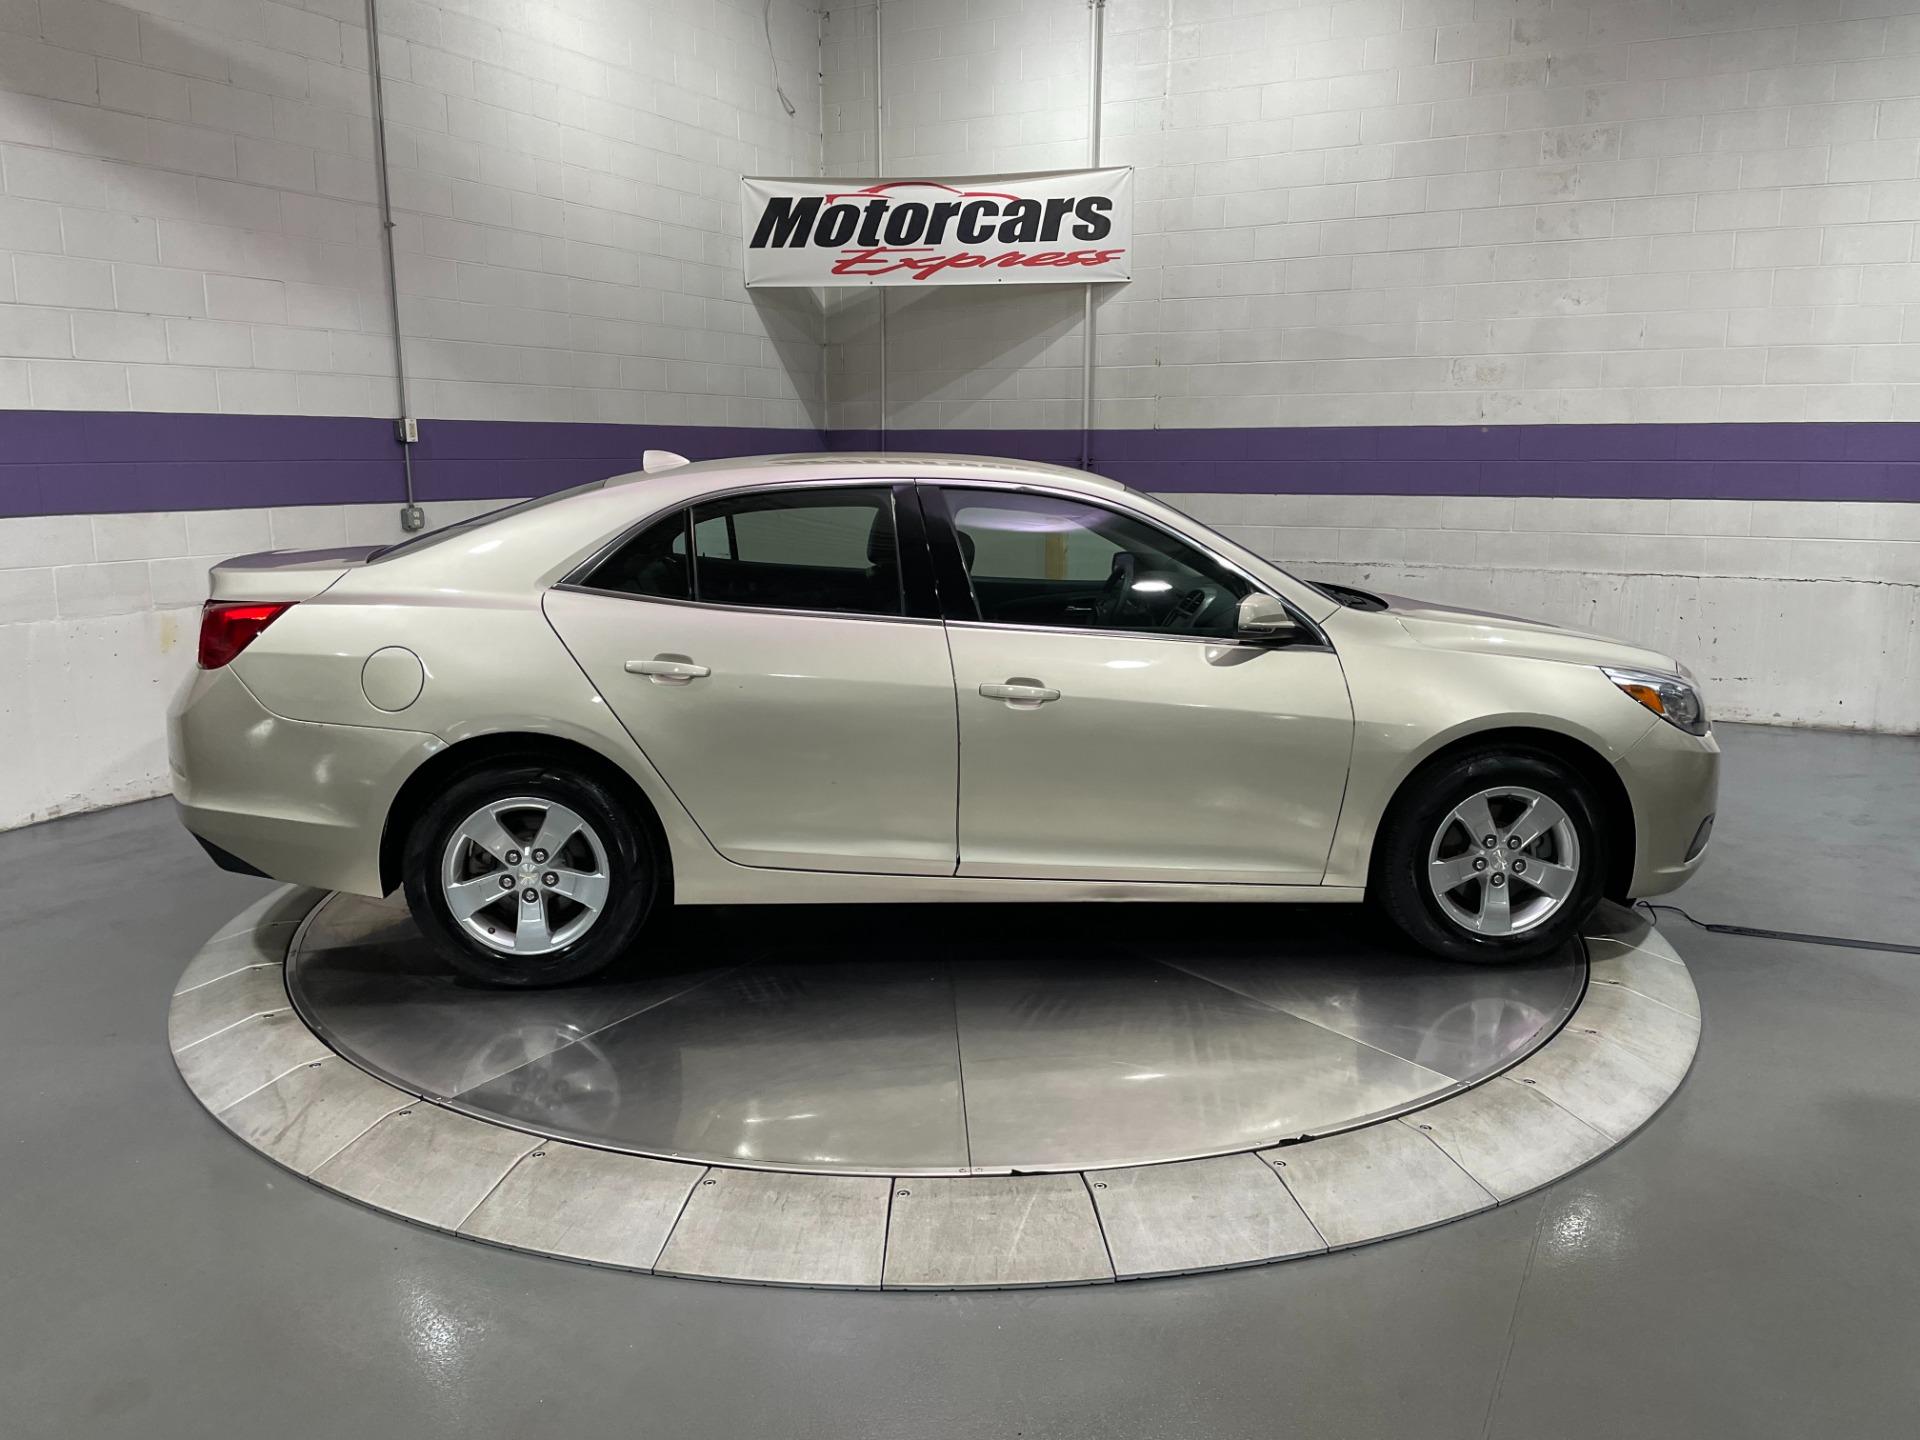 Used-2013-Chevrolet-Malibu-LT-FWD